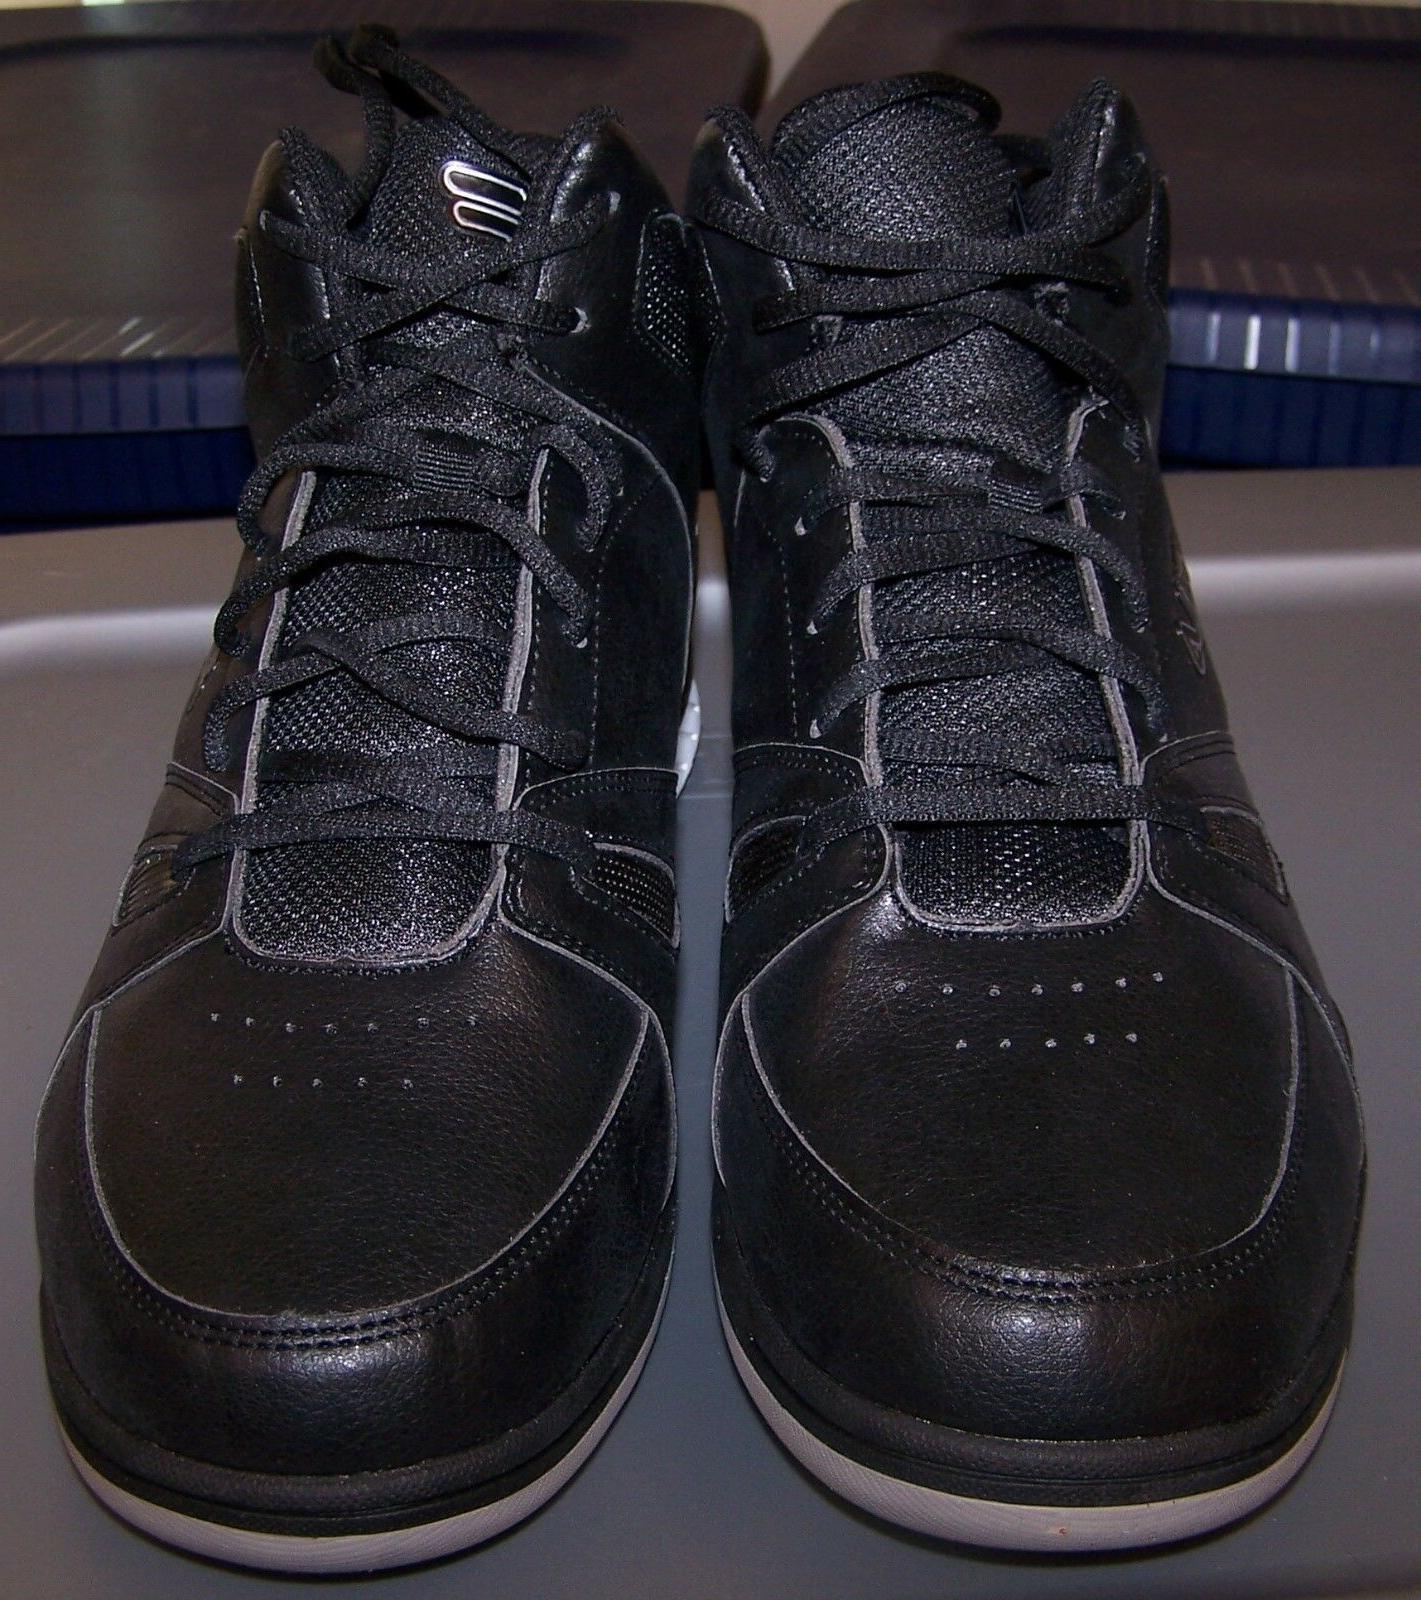 Fila Thunderceptor 2 Shoes Sneakers High Black 11.5